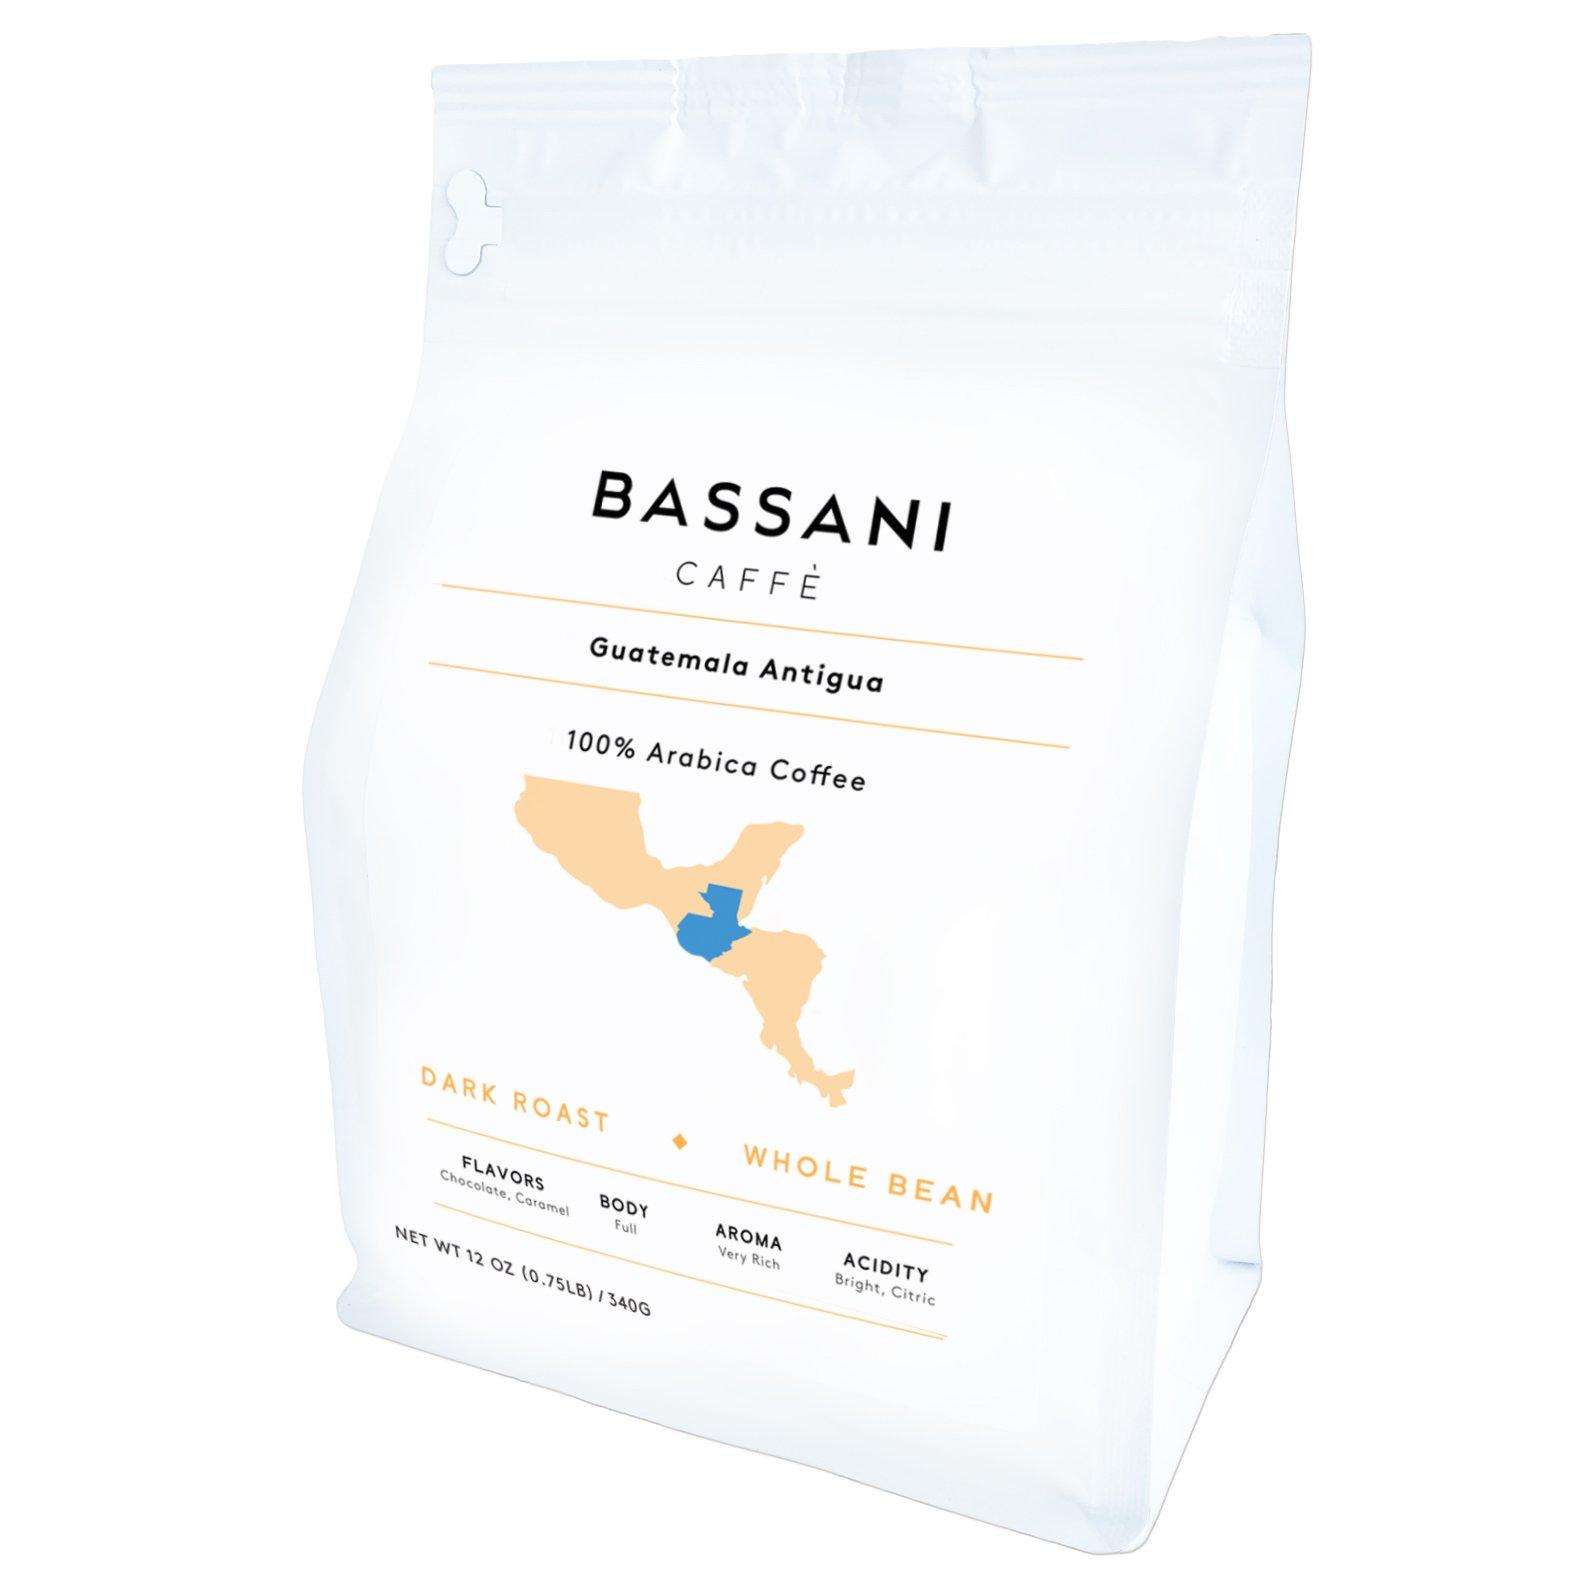 Bassani Caffè | Dark Roast 100% Arabica Coffee | 0.75 Pound (12 oz) Bag | Single Origin (Guatemala)